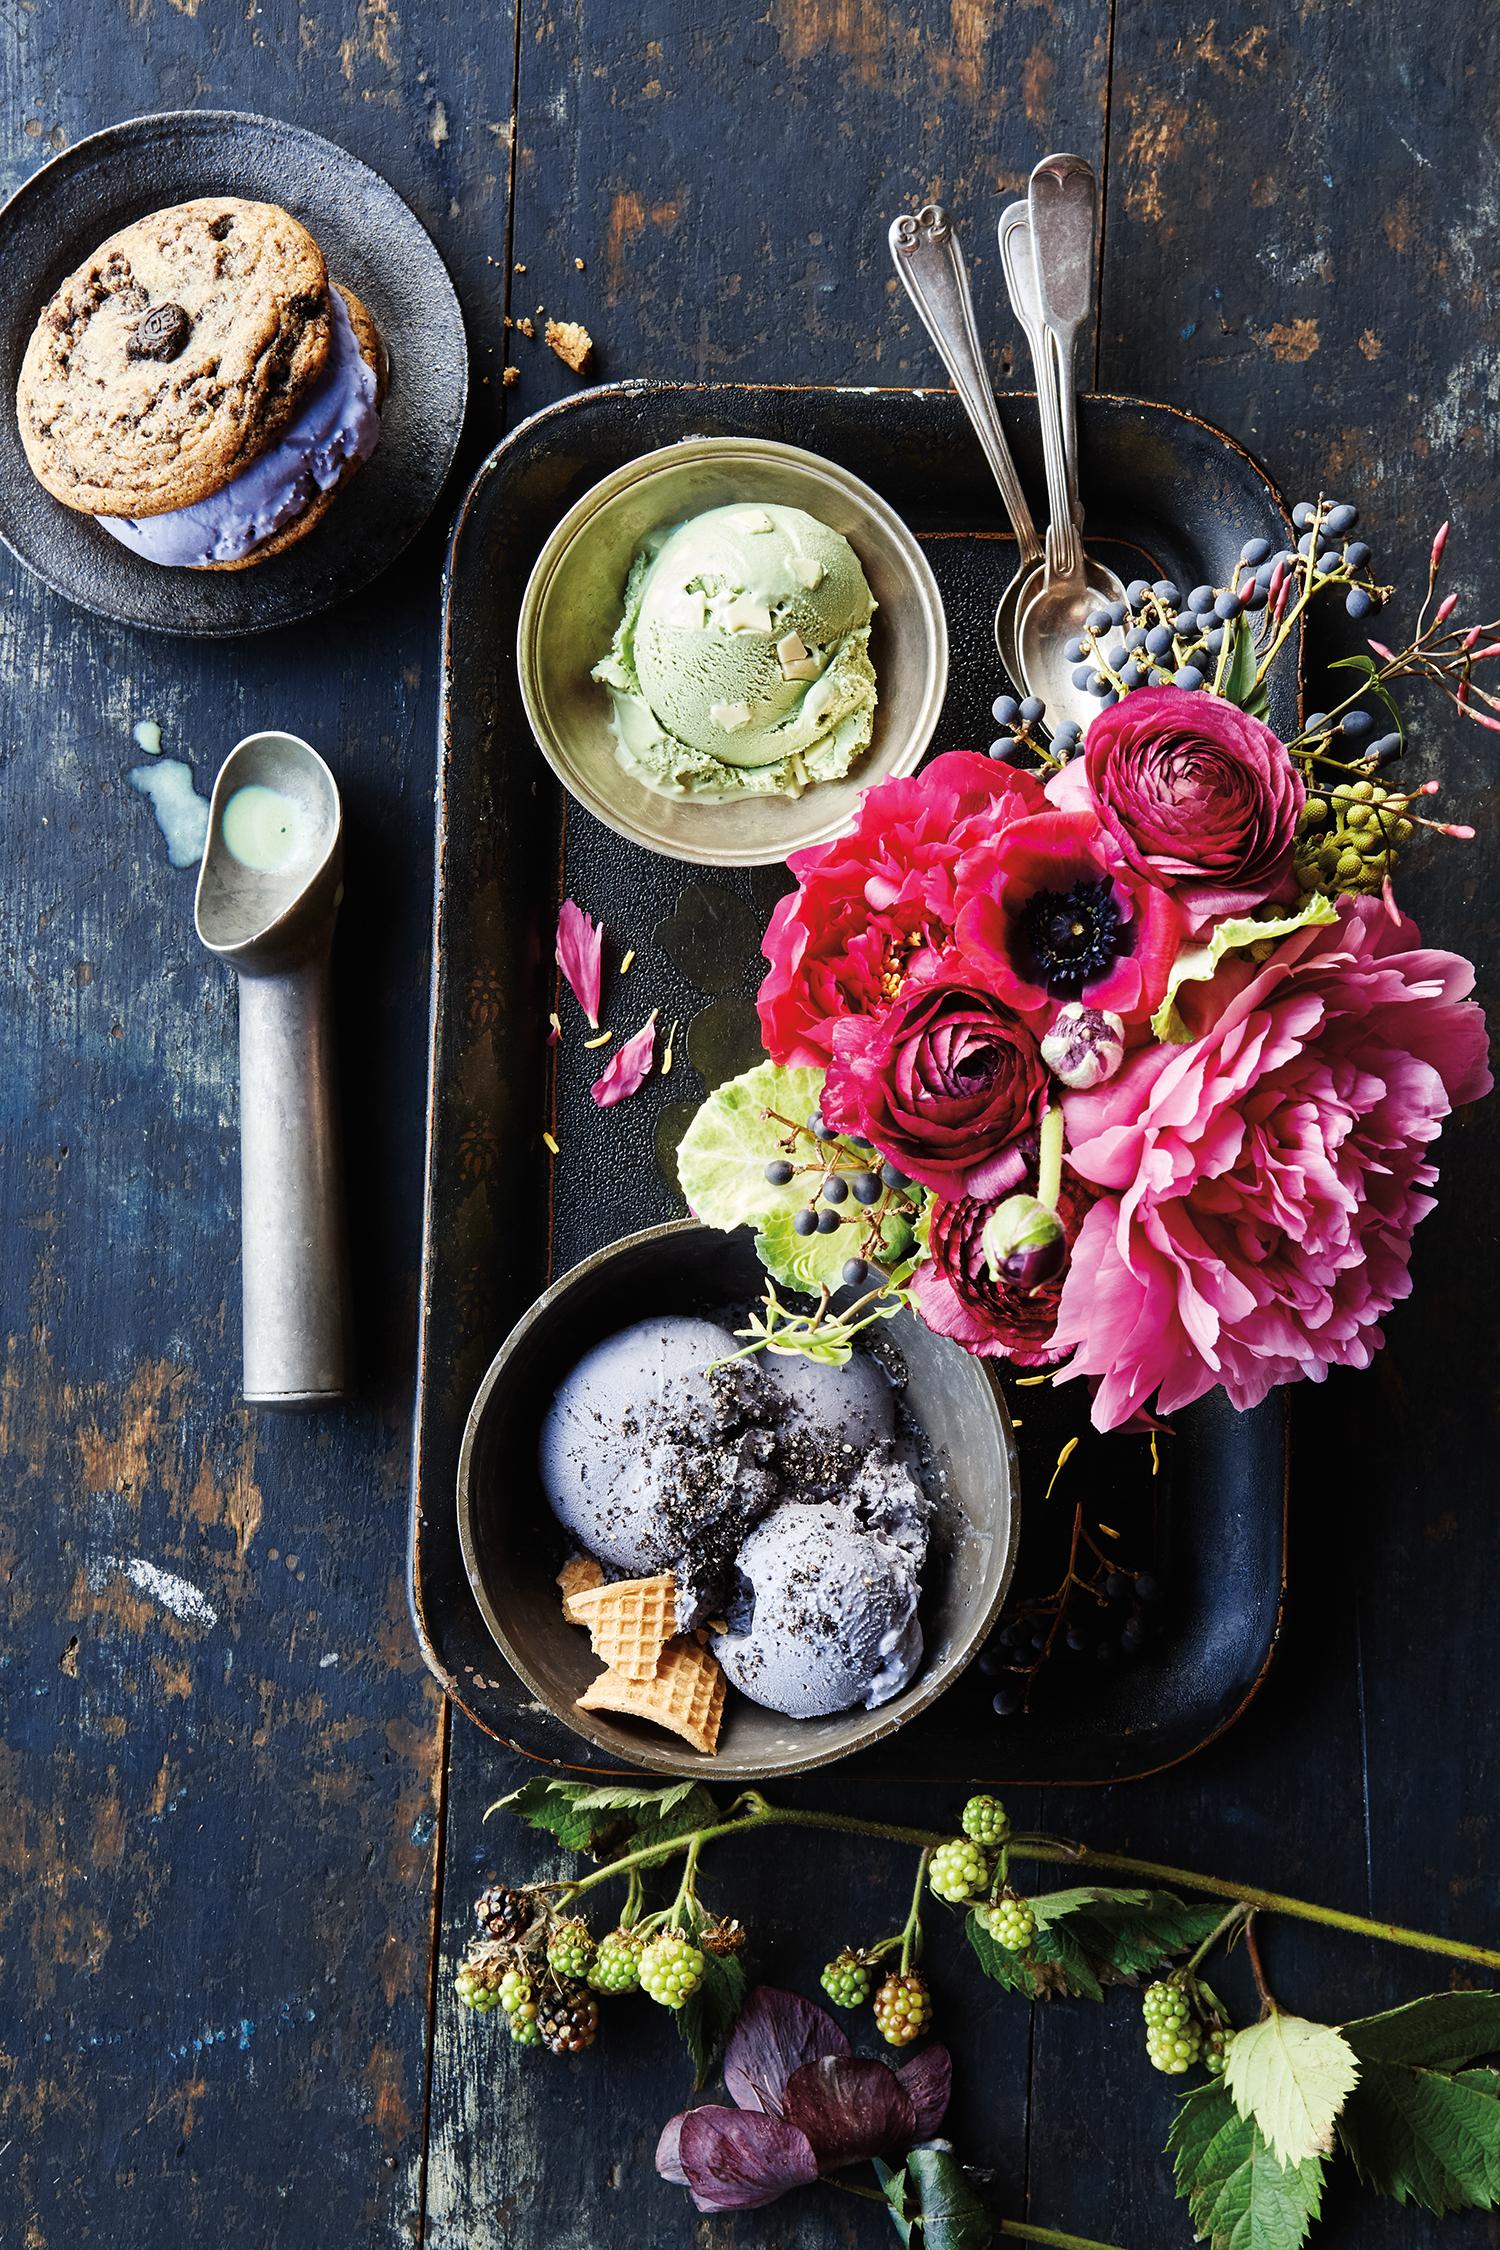 LWC_0617_Desserts_ColinPrice_Love Wins CA27225_RETOUCHED-web.jpg